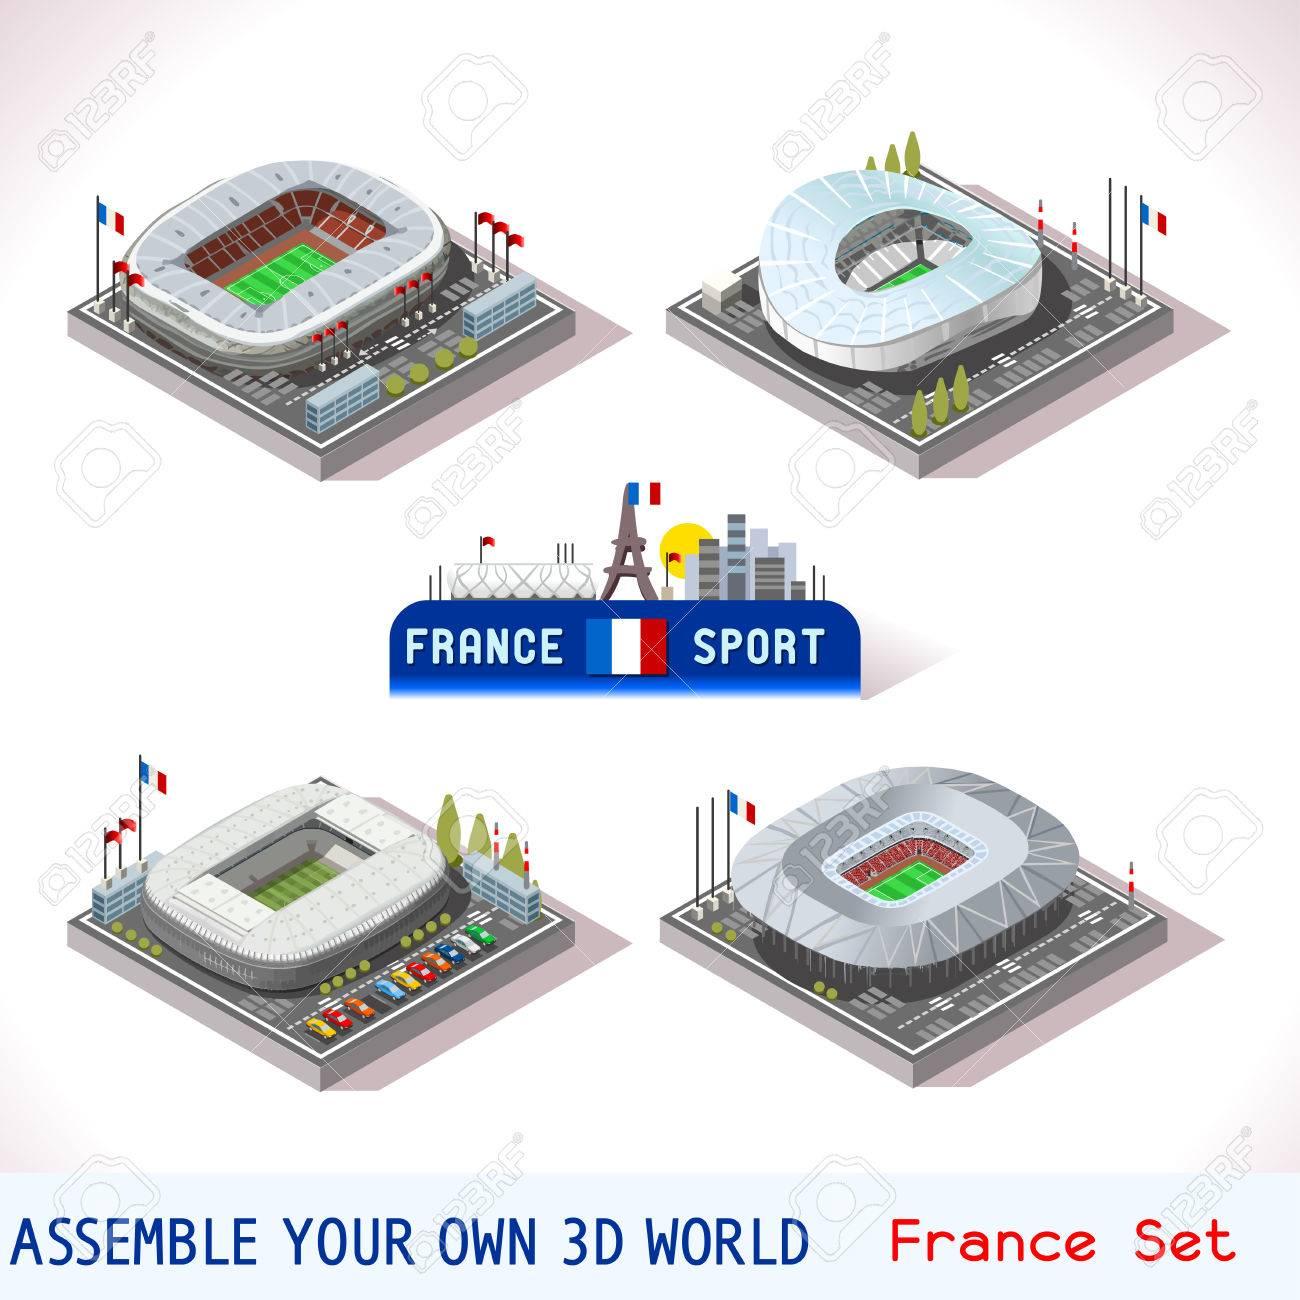 Icônes Du Stade De Football Euro France Nice Villeneuve Mauroy Decines Charpieu Olympique Marseille Velodrome Flat City Map 3d Isometric Infographic